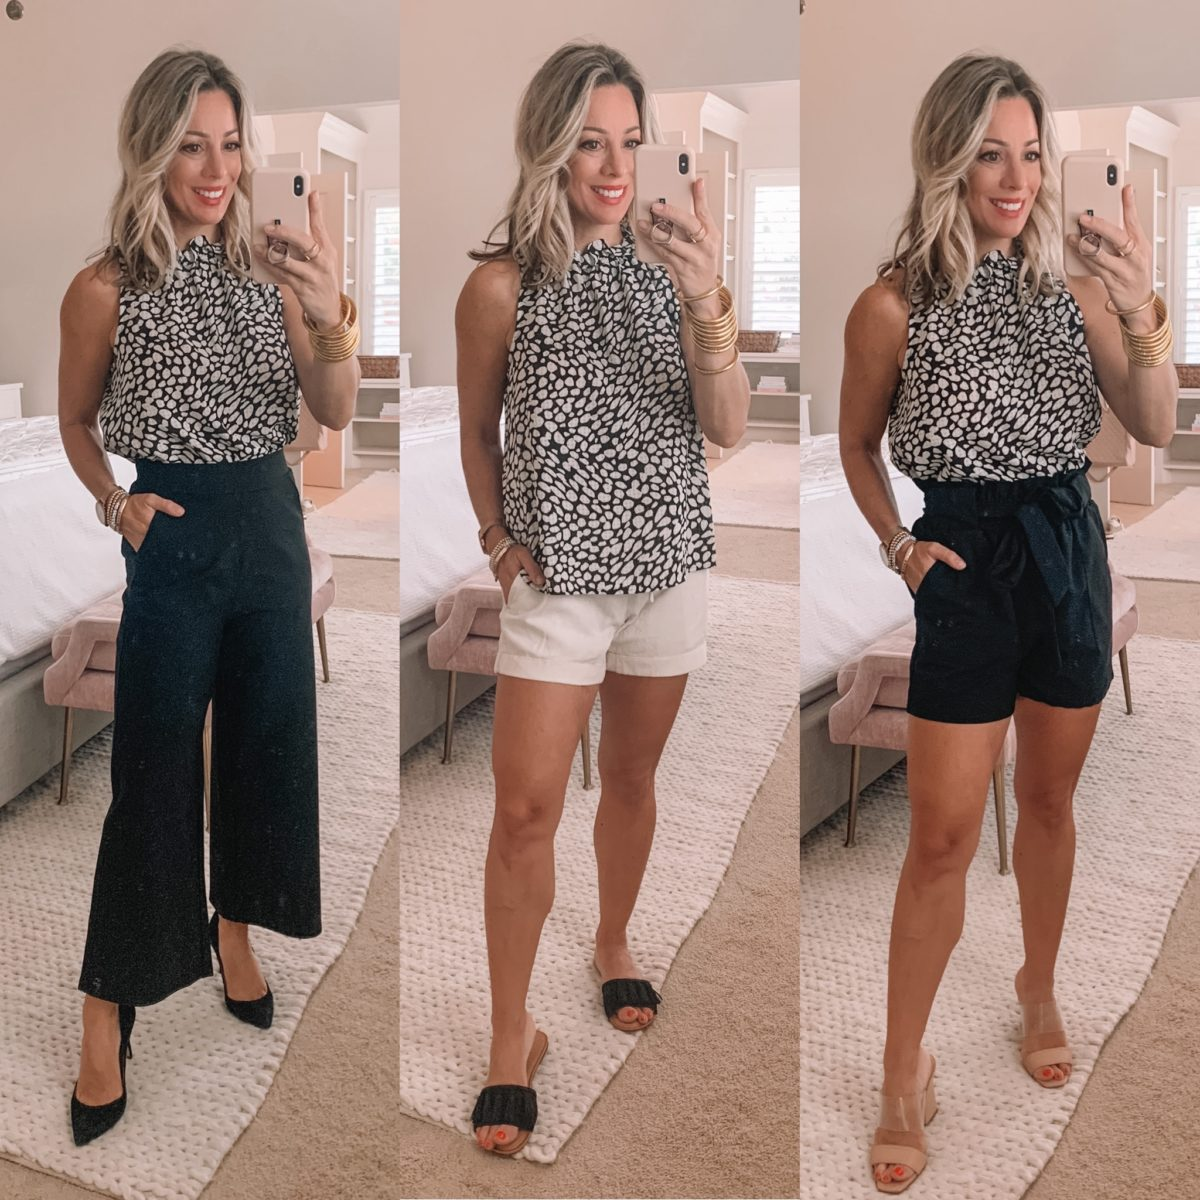 Dressing Room Finds Old Navy and Target, Dot Print Sleeveless, Paperbag waist pants, Shorts, Paperbag waist shorts, Heels, Slides, Sandals